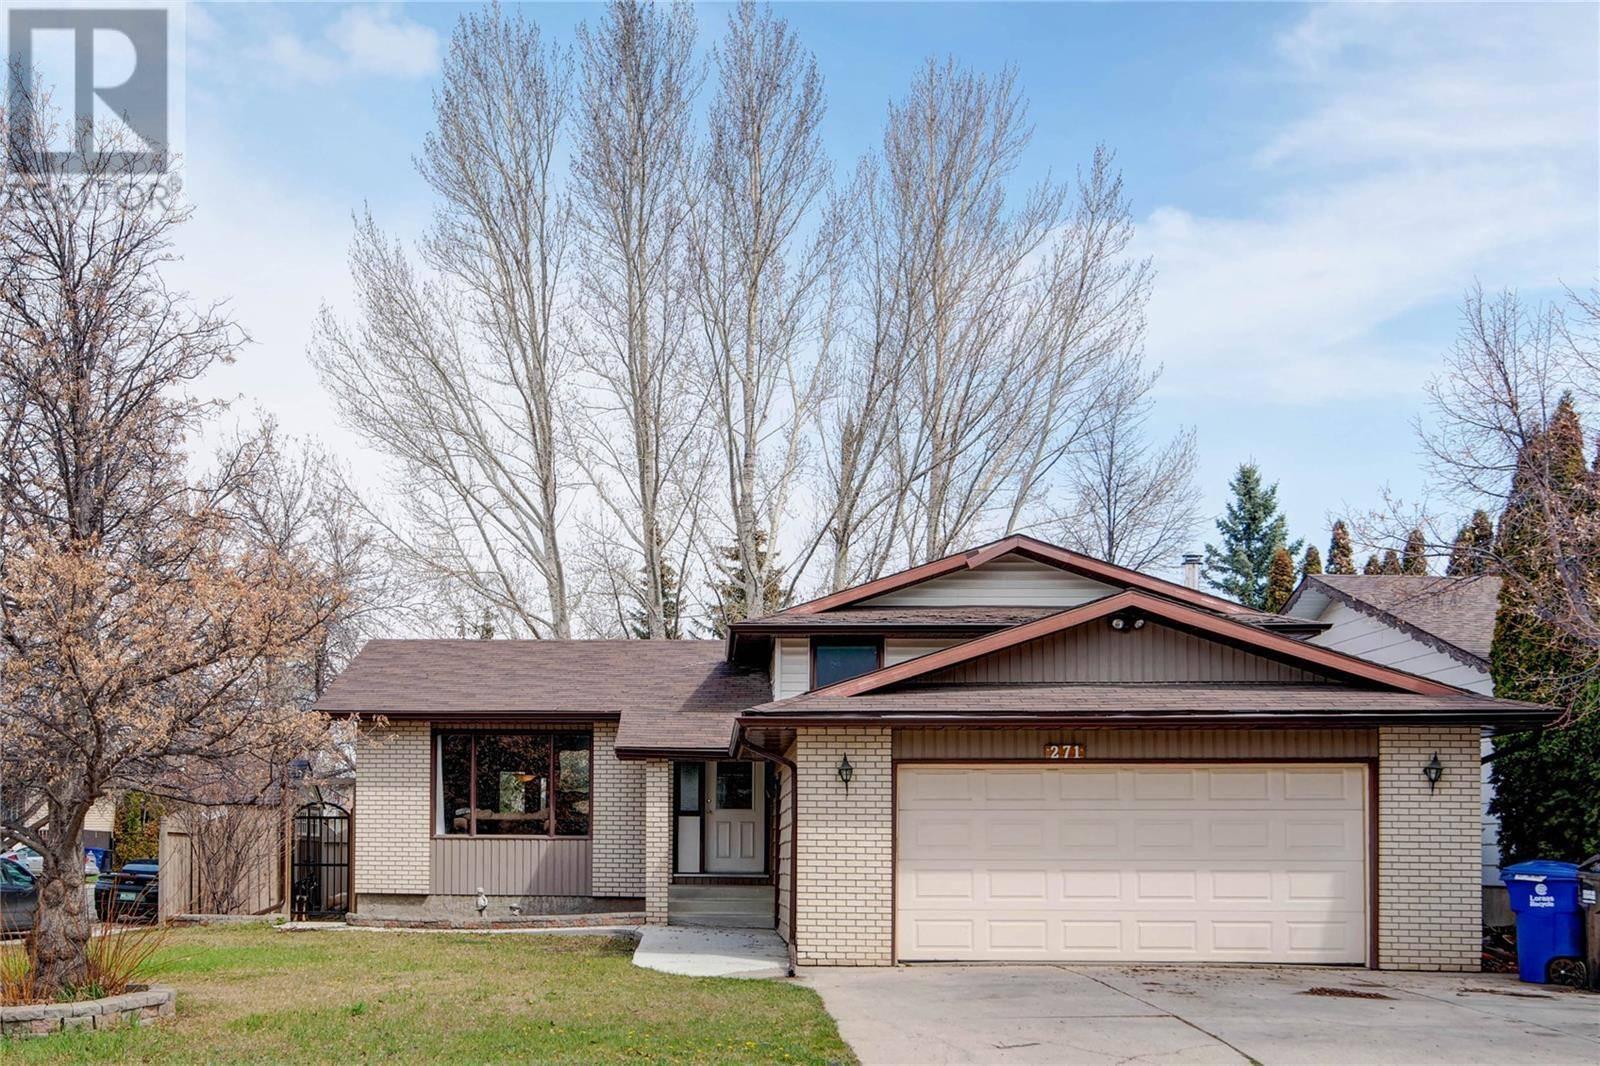 House for sale at 271 Girgulis Ct Saskatoon Saskatchewan - MLS: SK783040